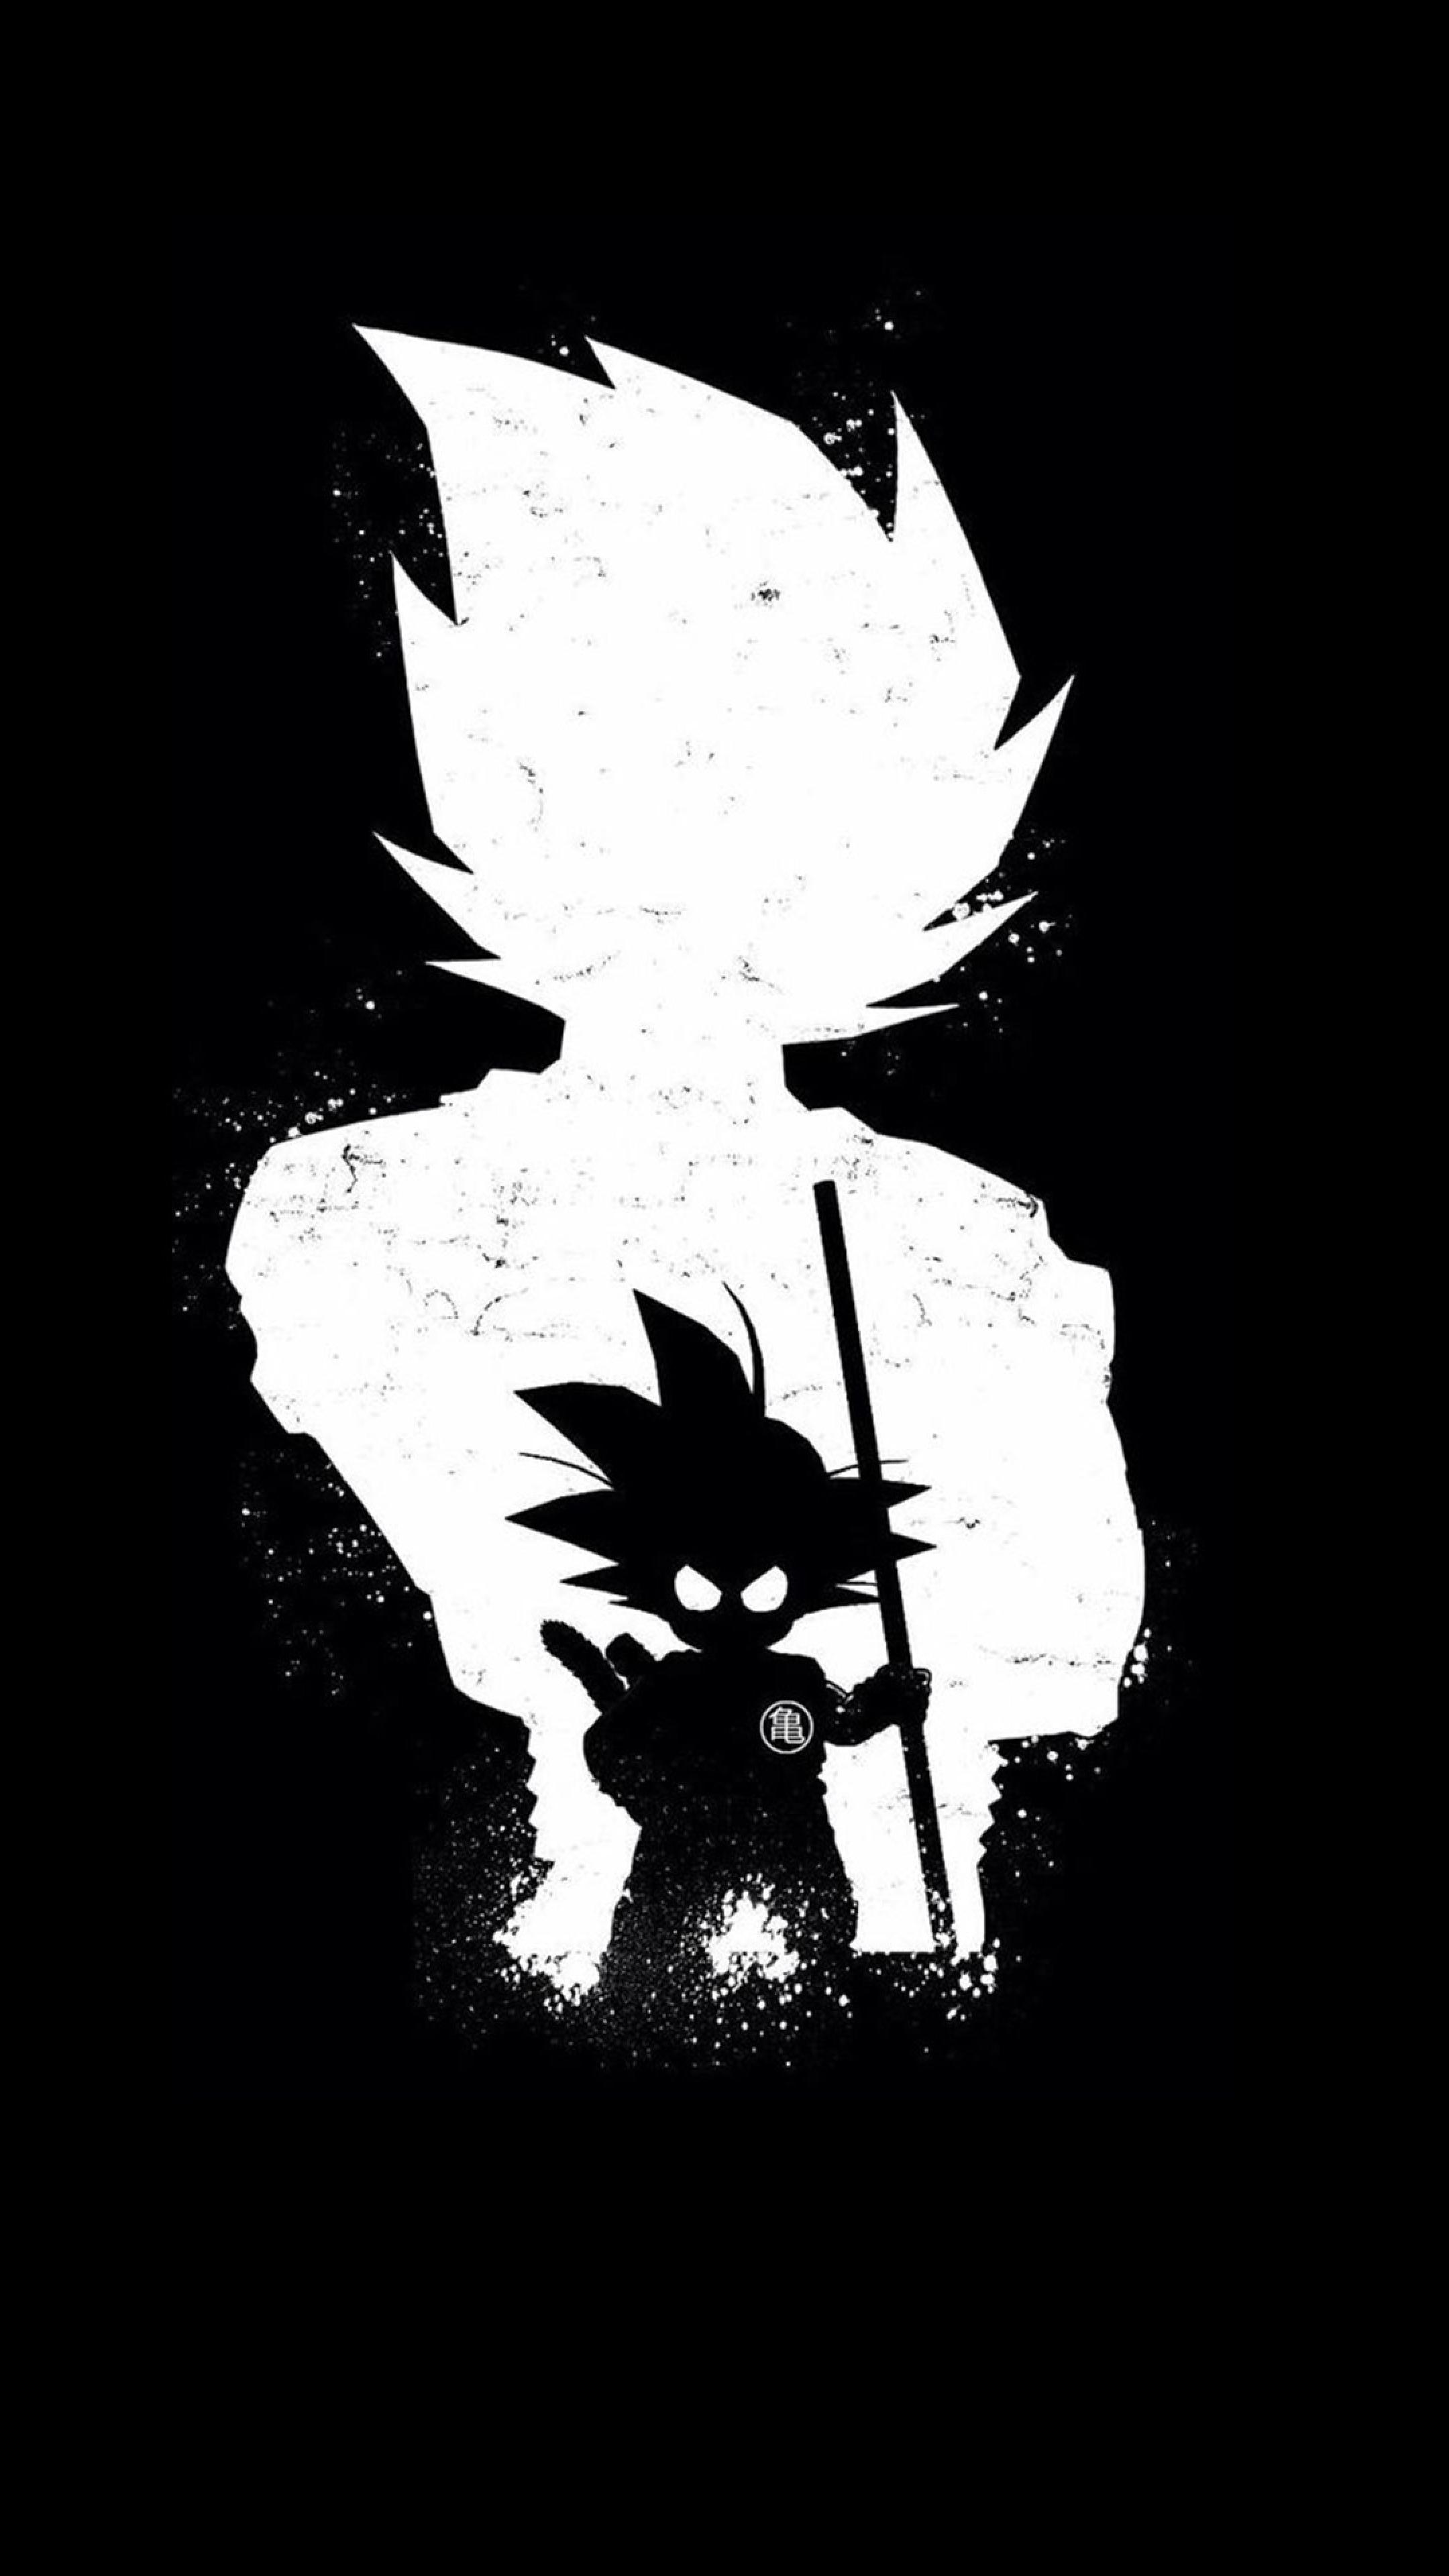 Goku anime dark black hd 4k wallpaper - Portrait anime wallpaper ...